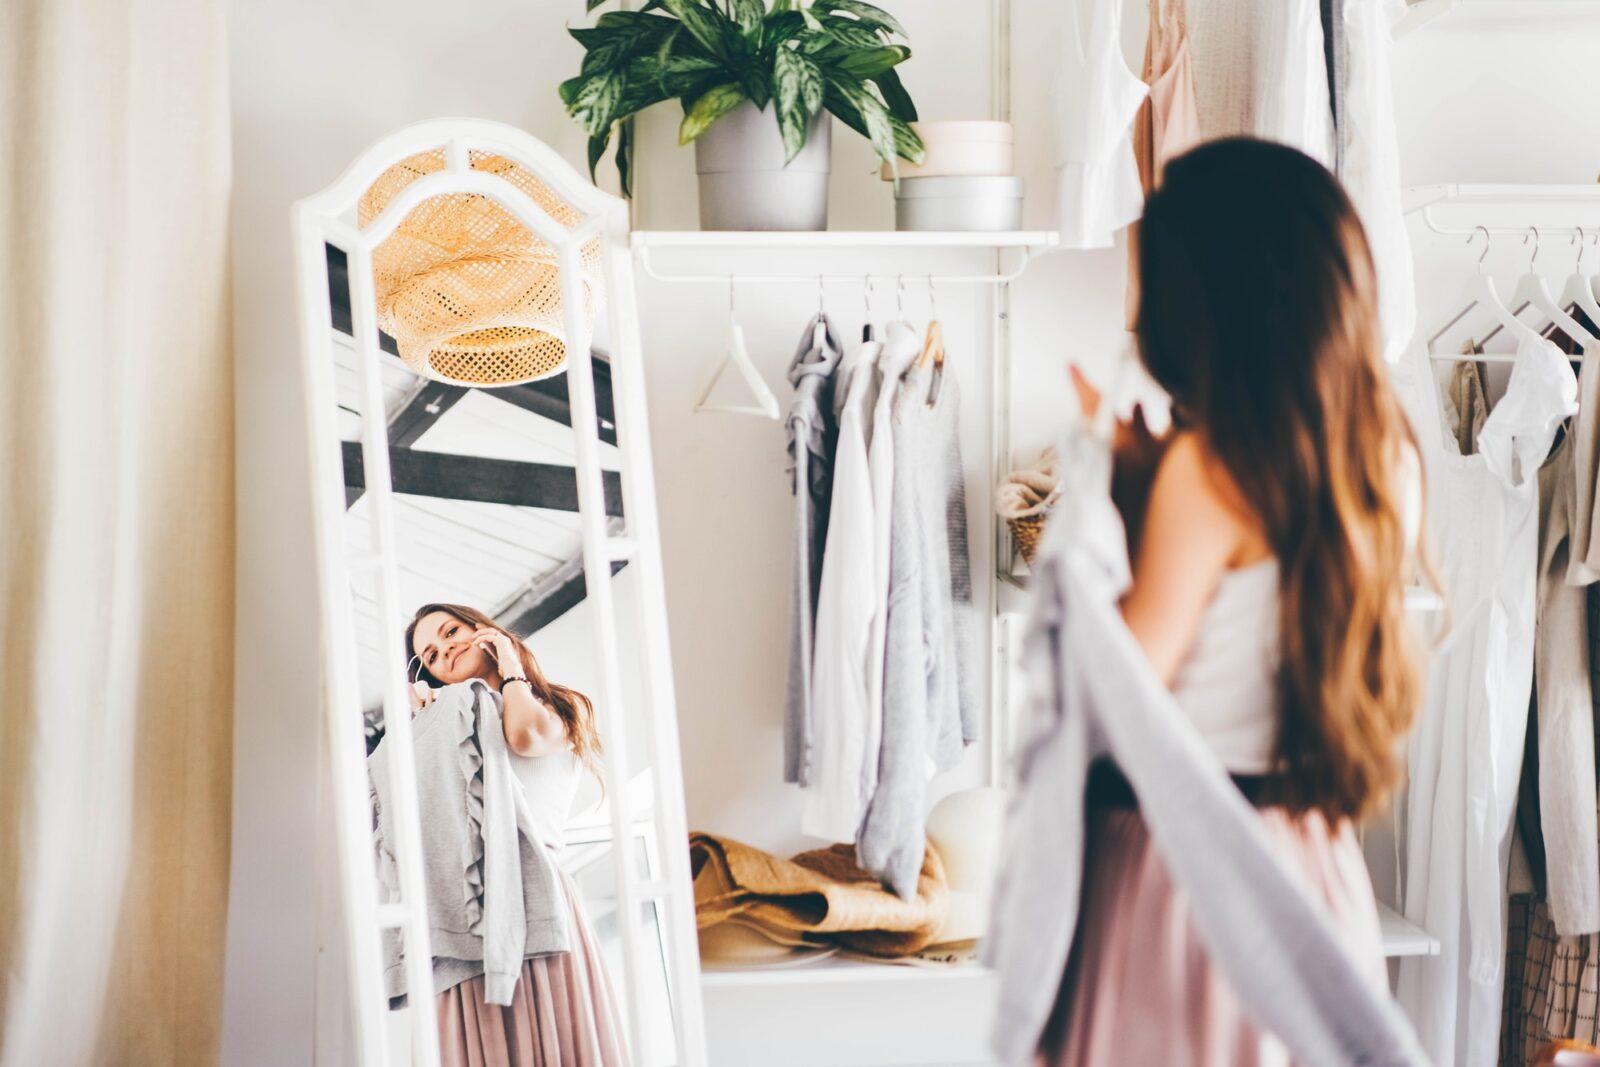 woman in pink skirt talks on mobile phone choosing elegant clothes in wardrobe room